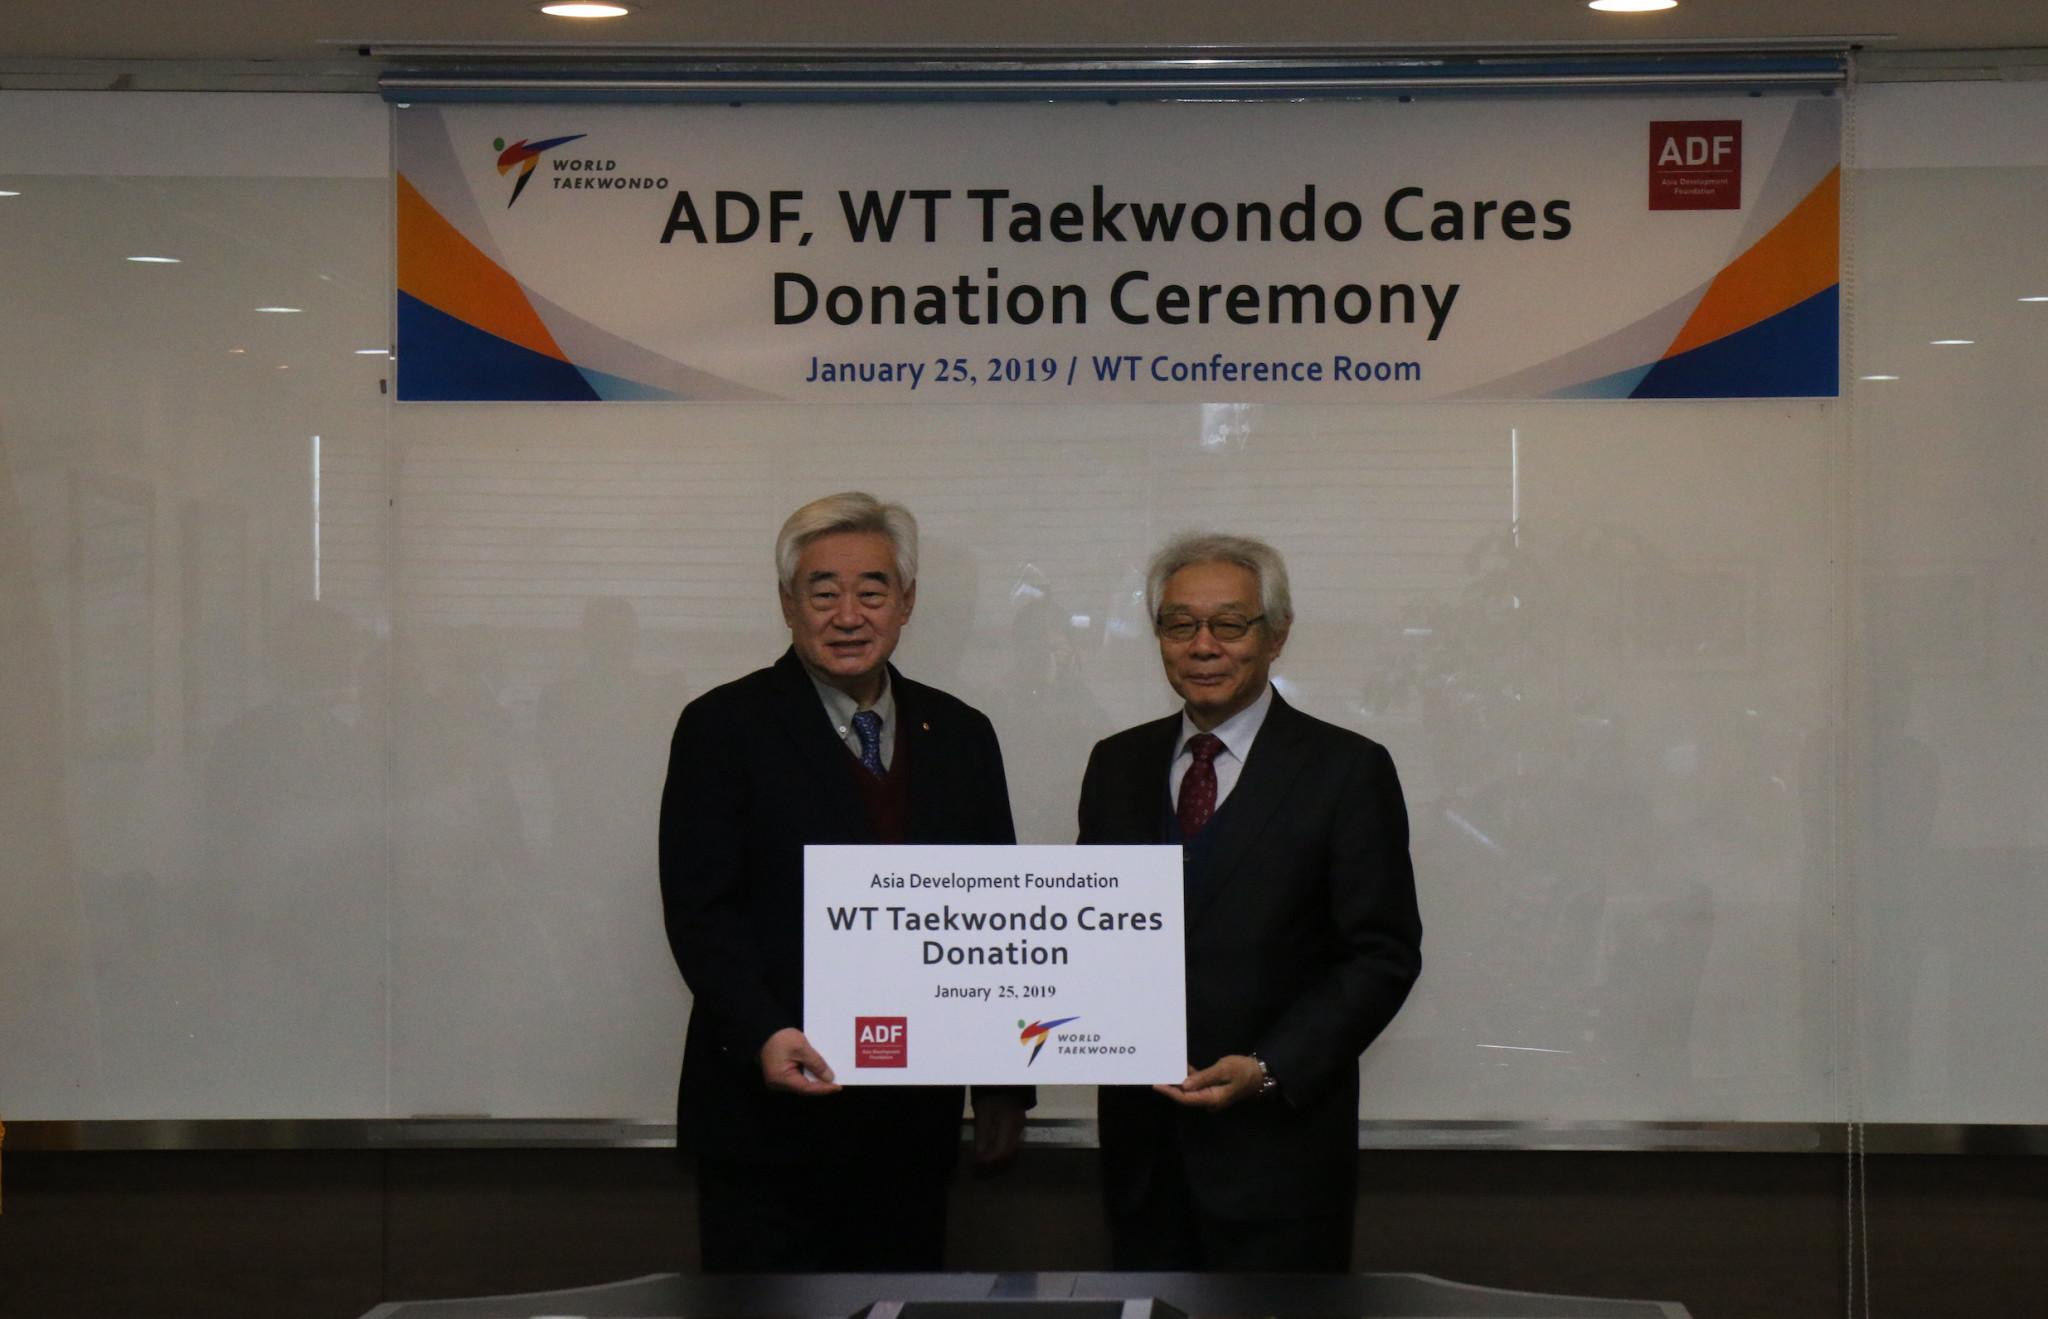 World Taekwondo receive $90,000 donation from Asia Development Foundation